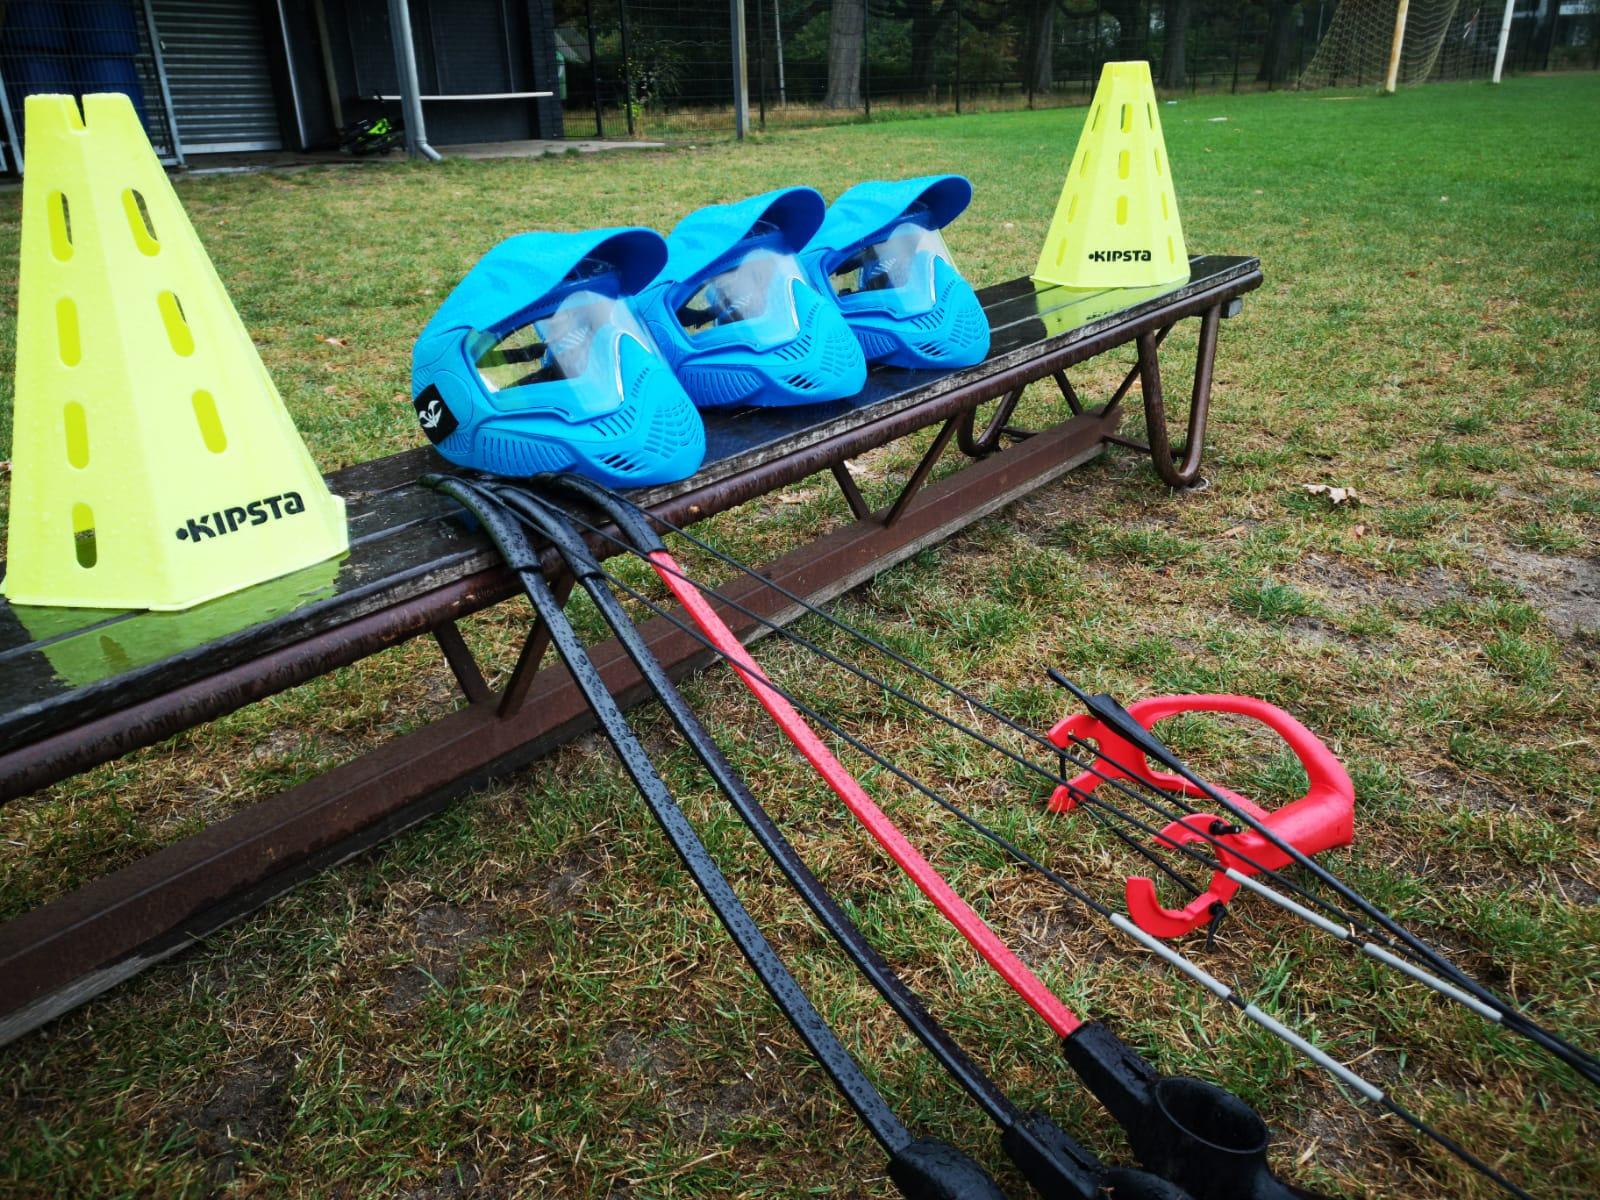 Archery tag set